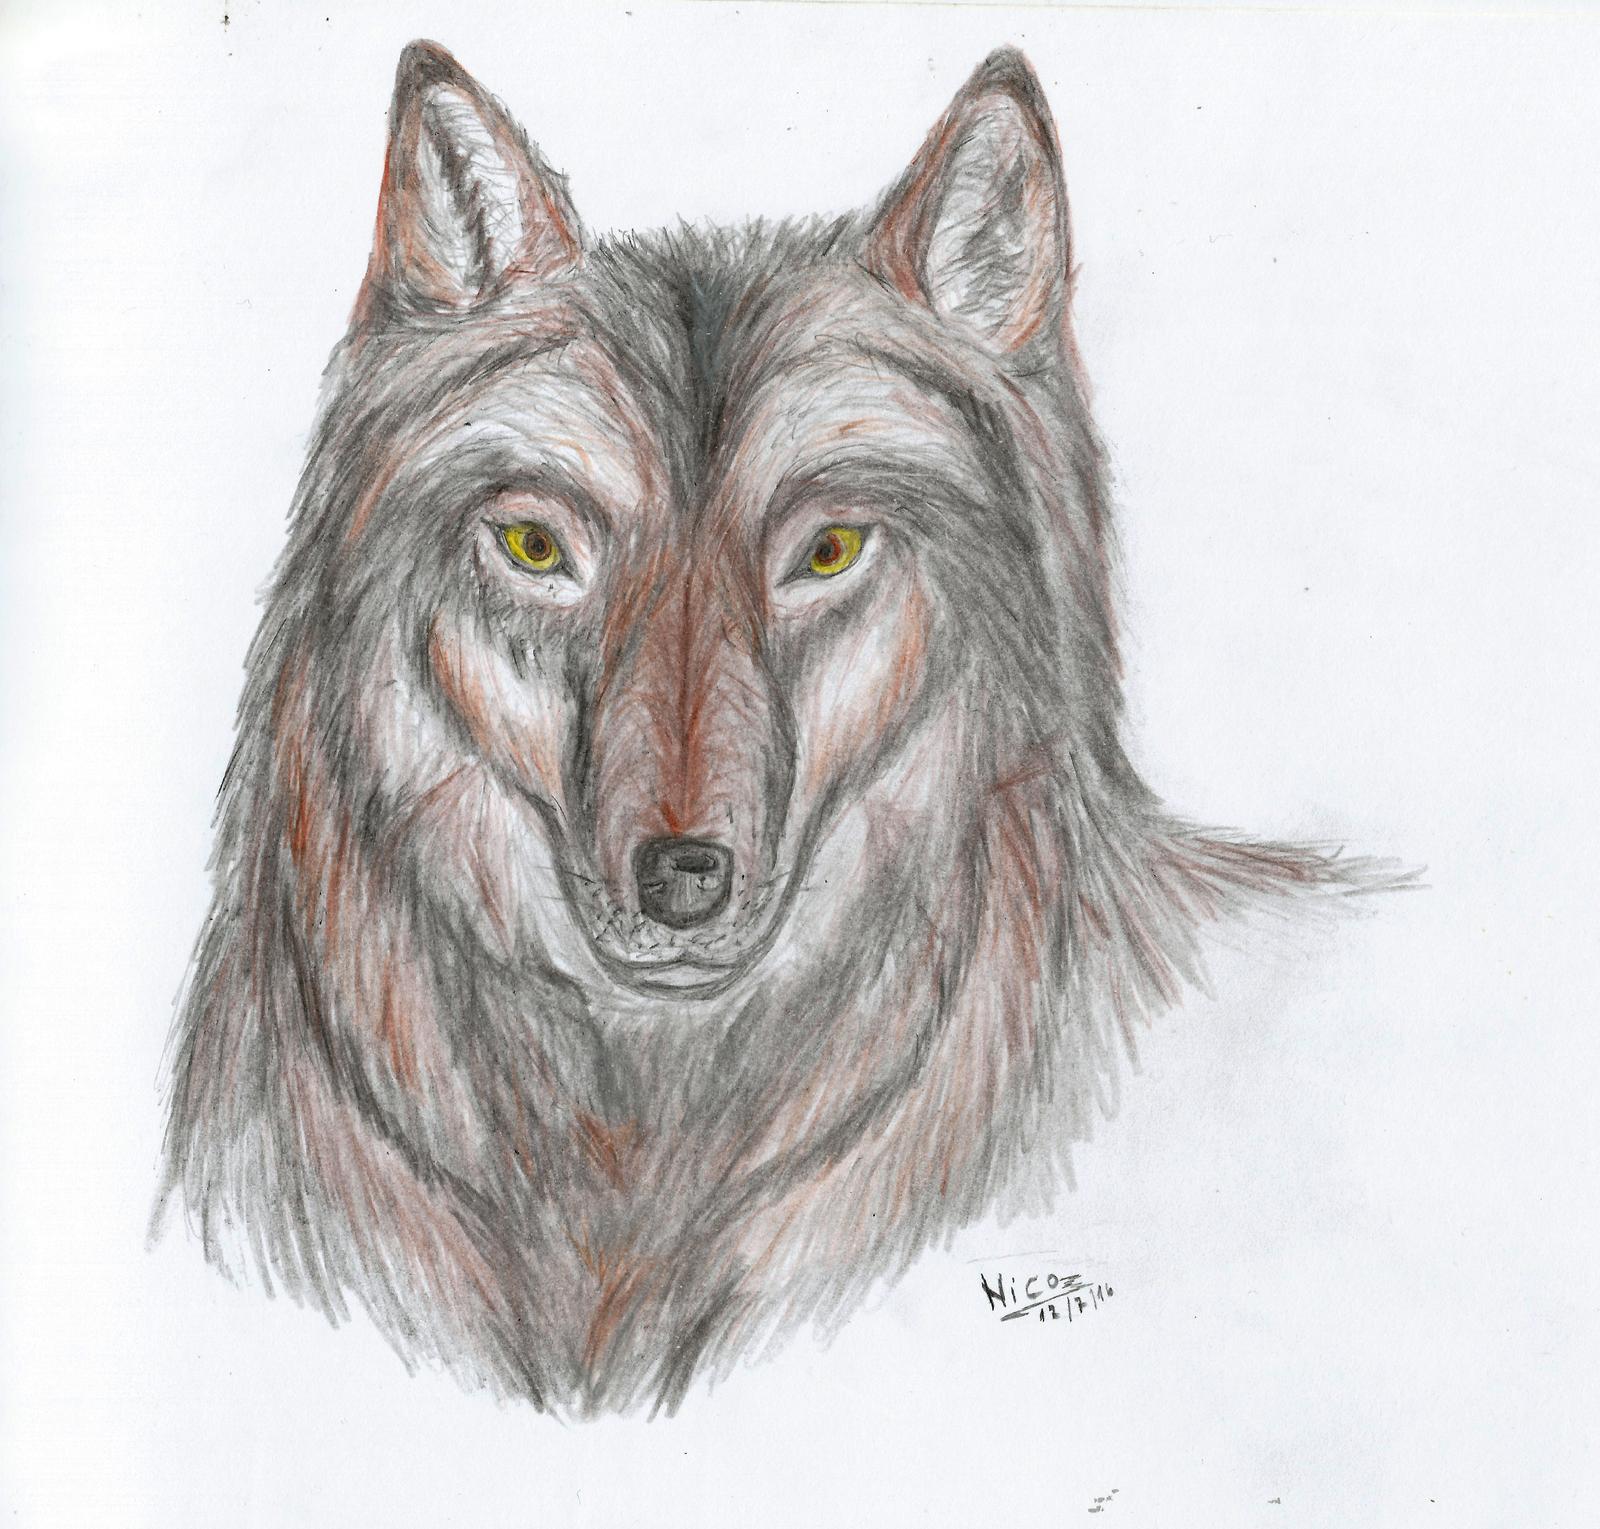 lobo dibujo by nicowtc